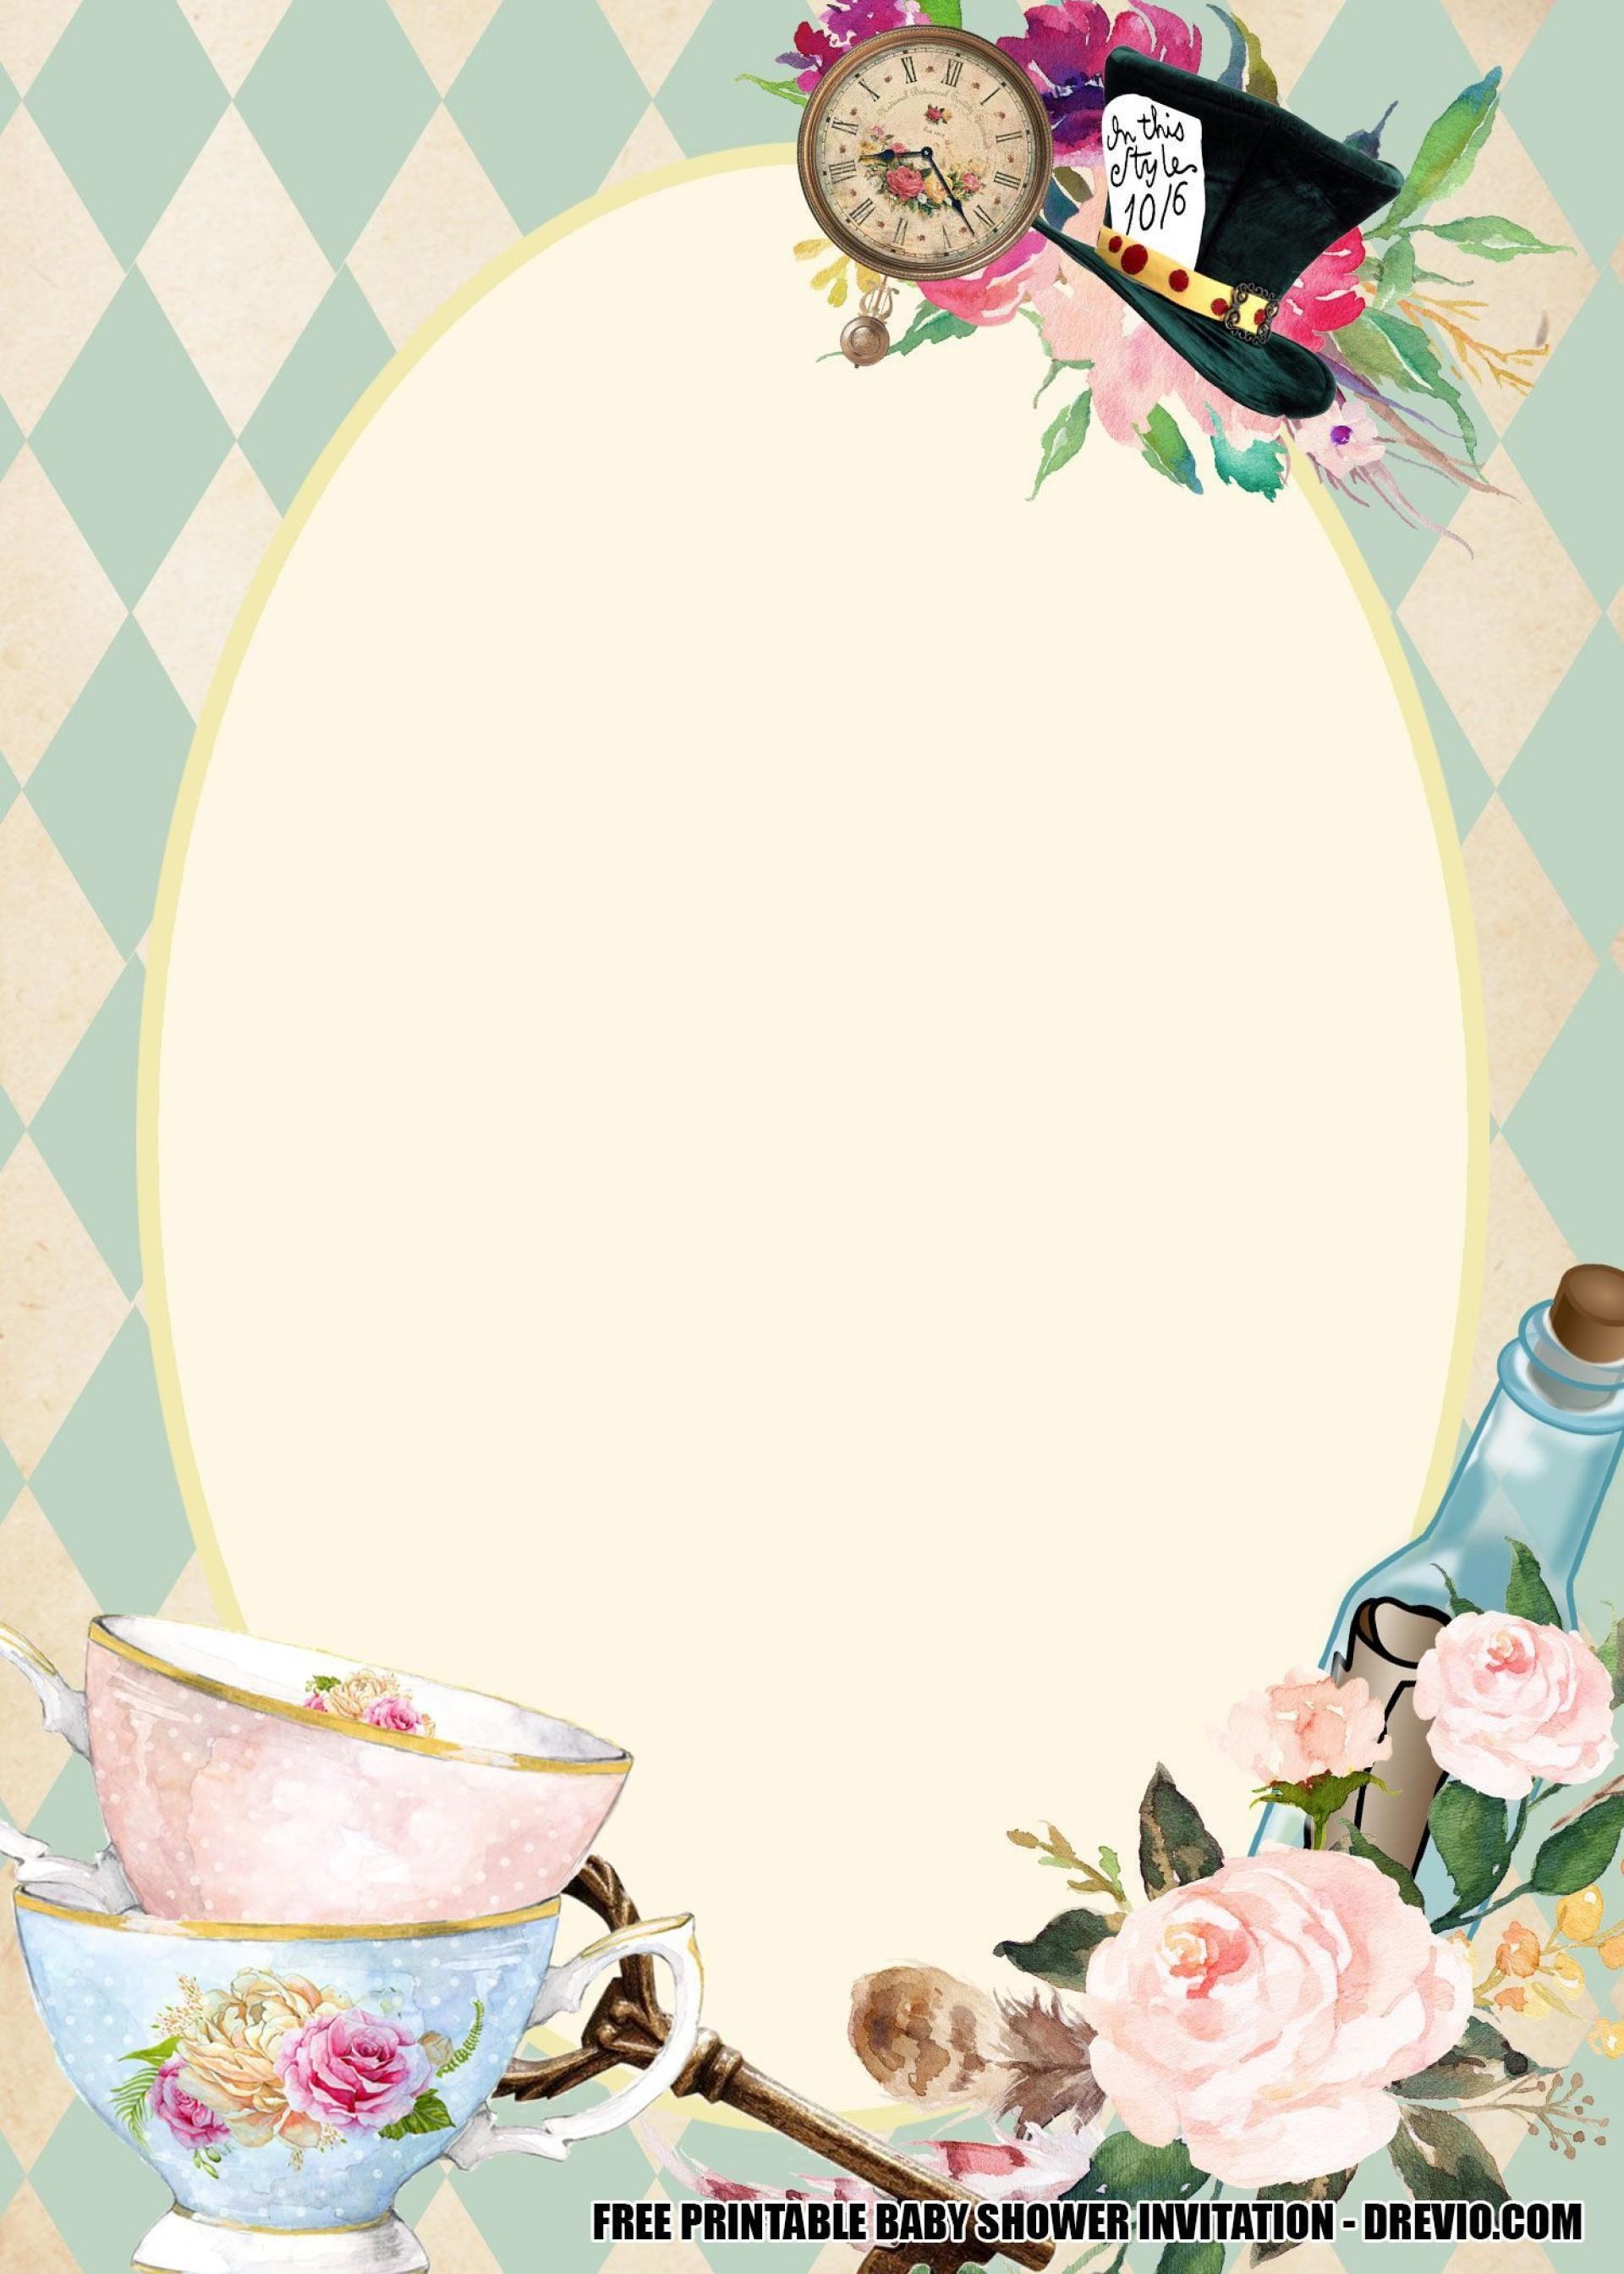 009 Imposing Alice In Wonderland Invitation Template High Resolution  Templates Wedding Birthday Free Tea Party1920